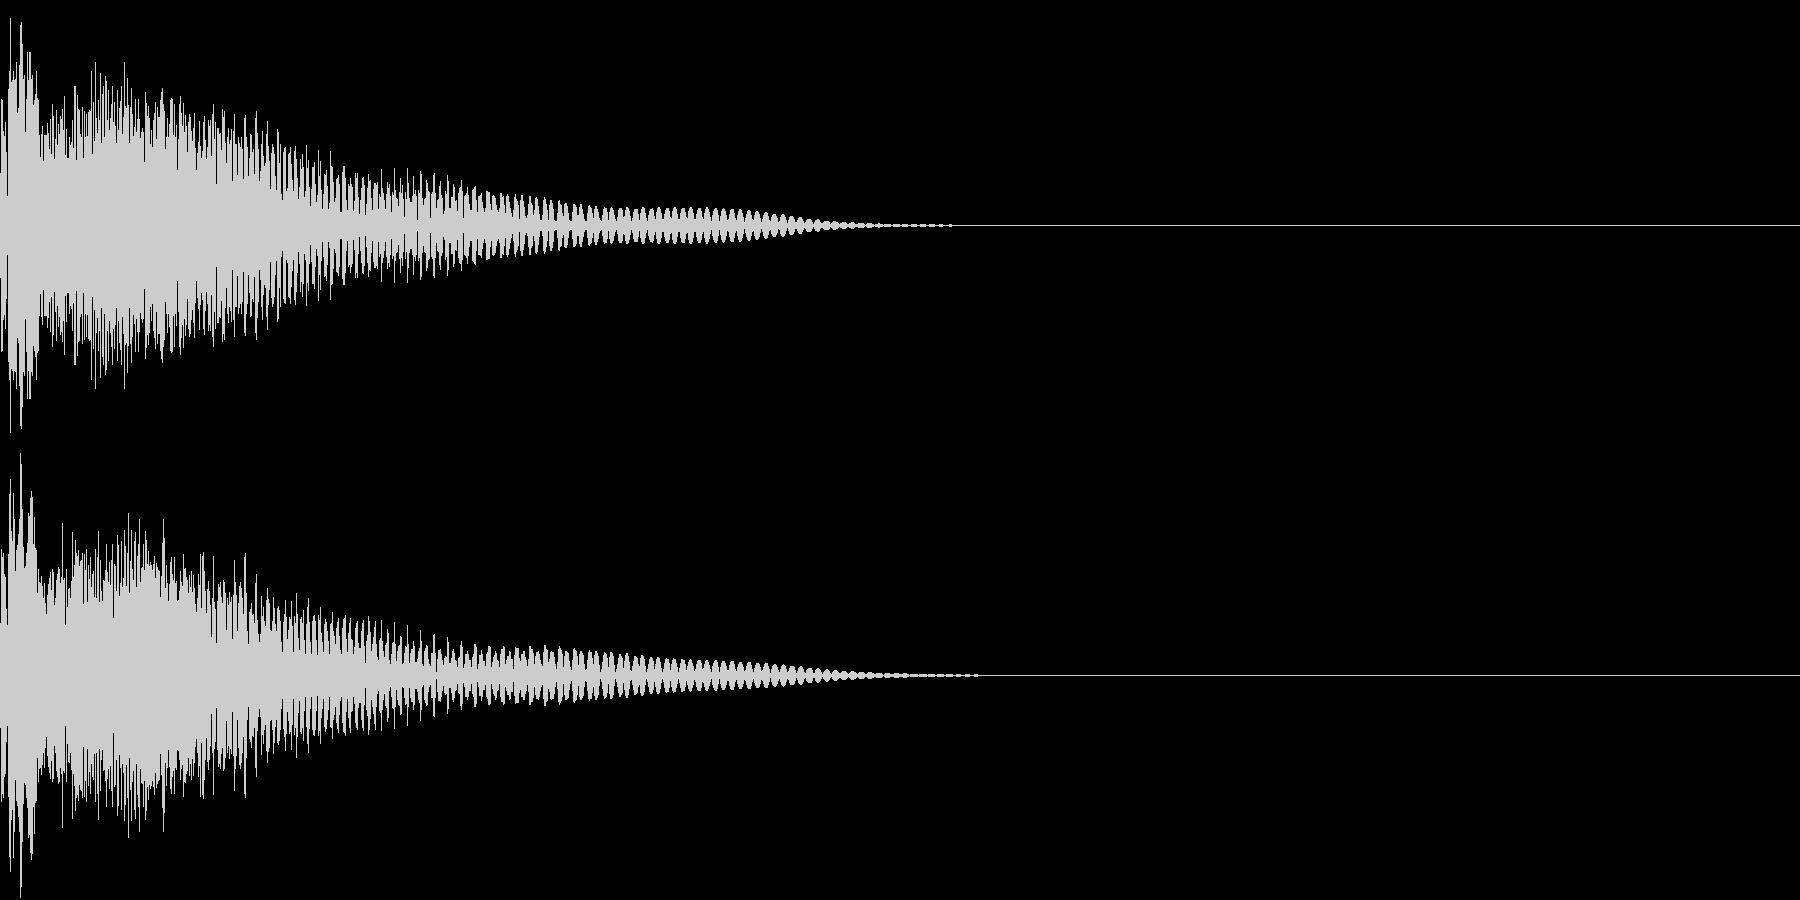 GAME 汎用性の高い攻撃音・ダメージ音の未再生の波形